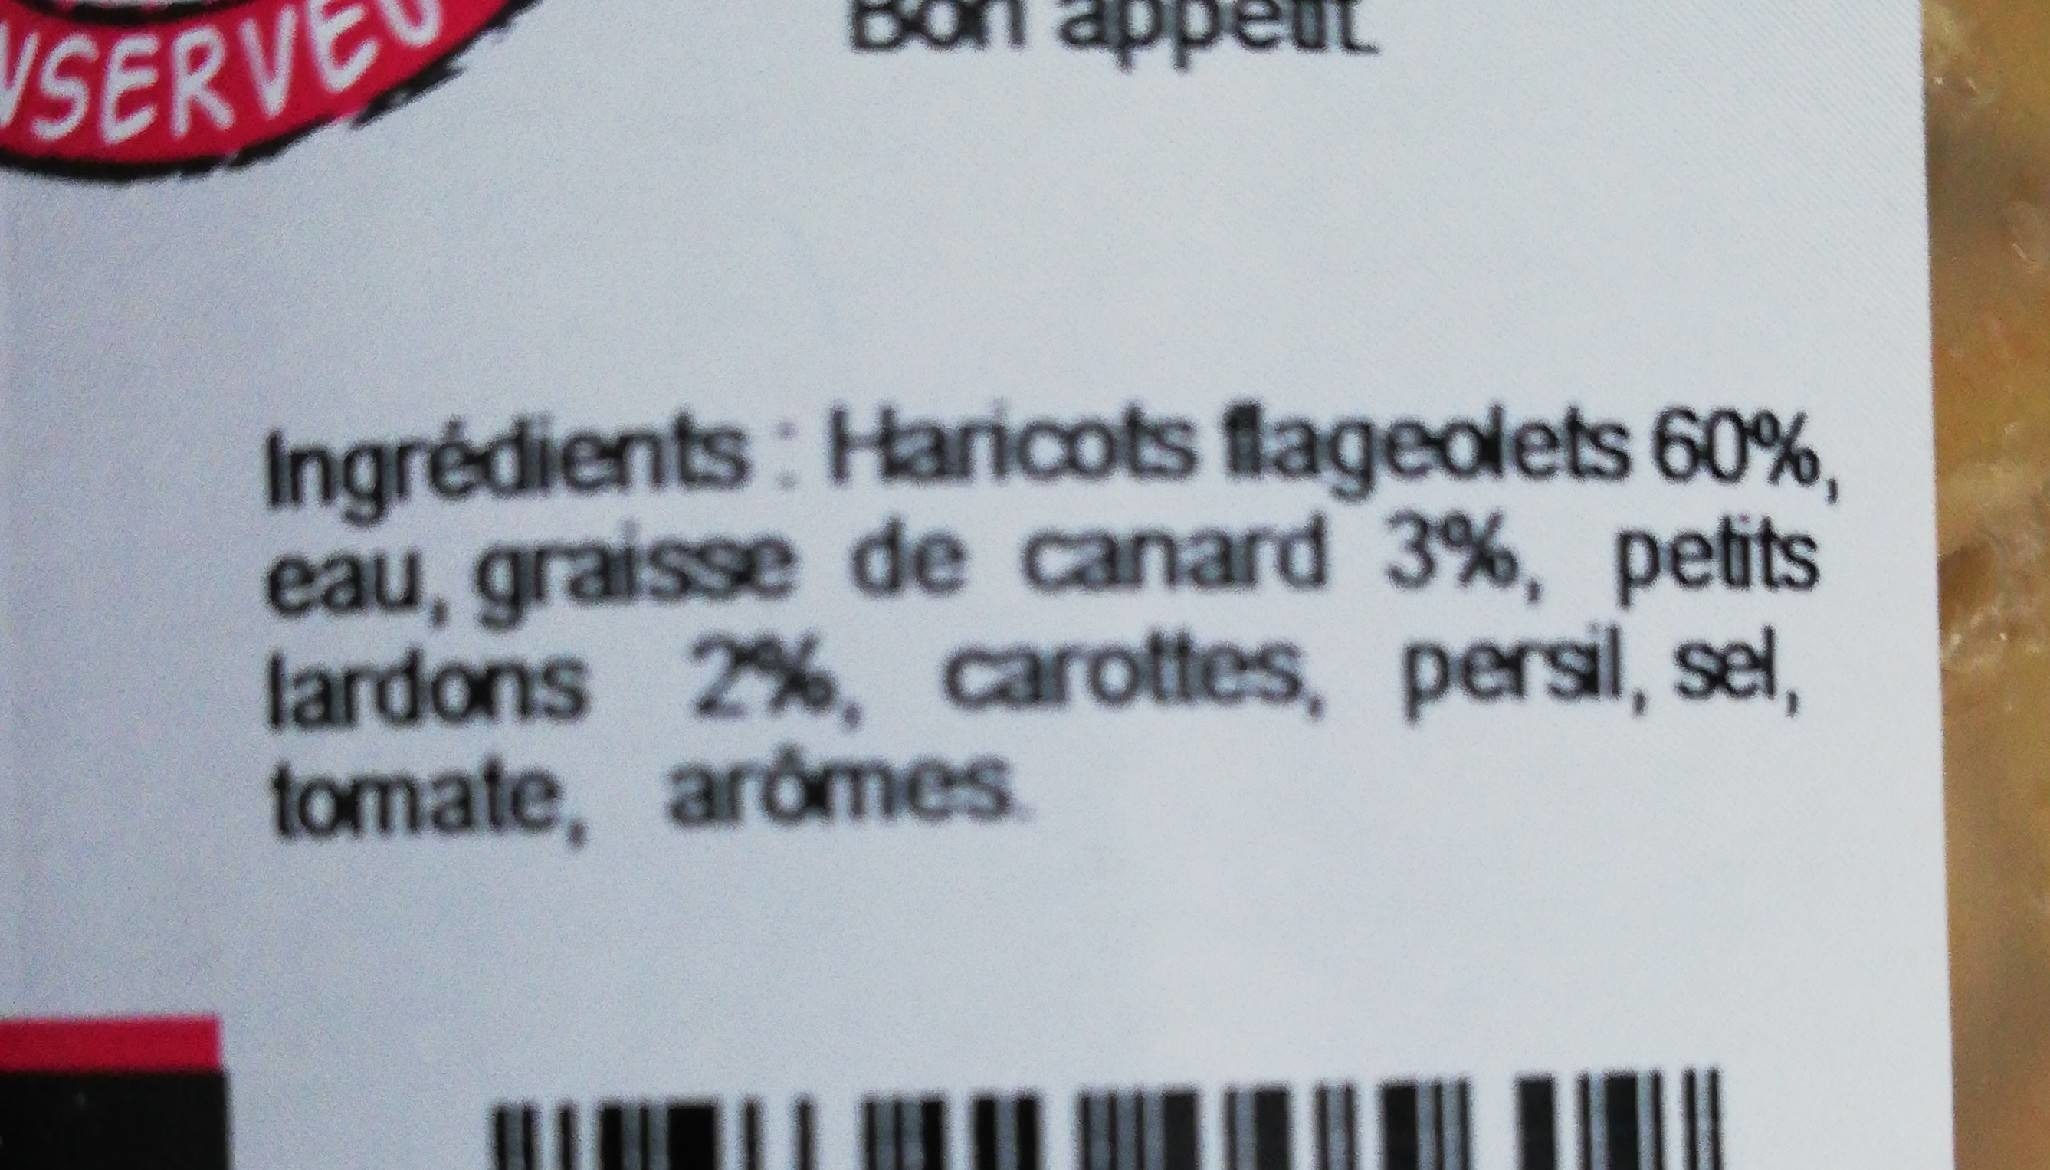 Flageolets - Ingredients